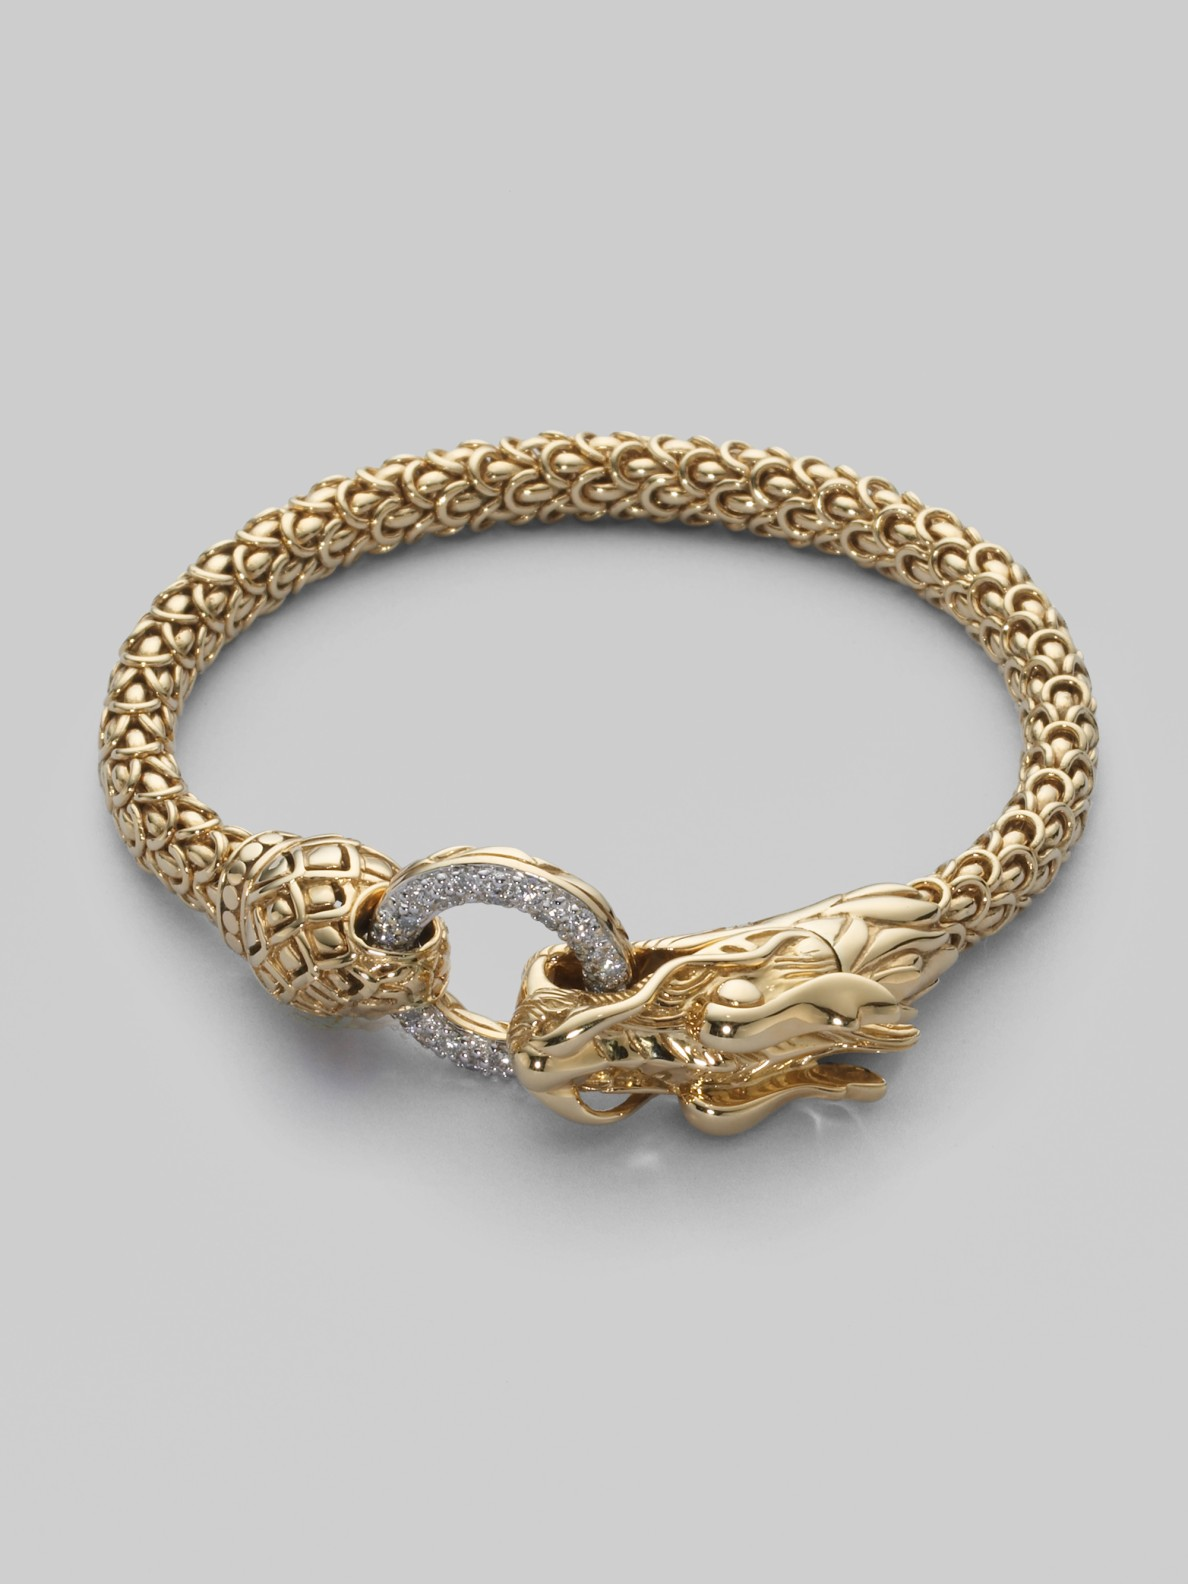 Nordstrom Jewelry Bracelets